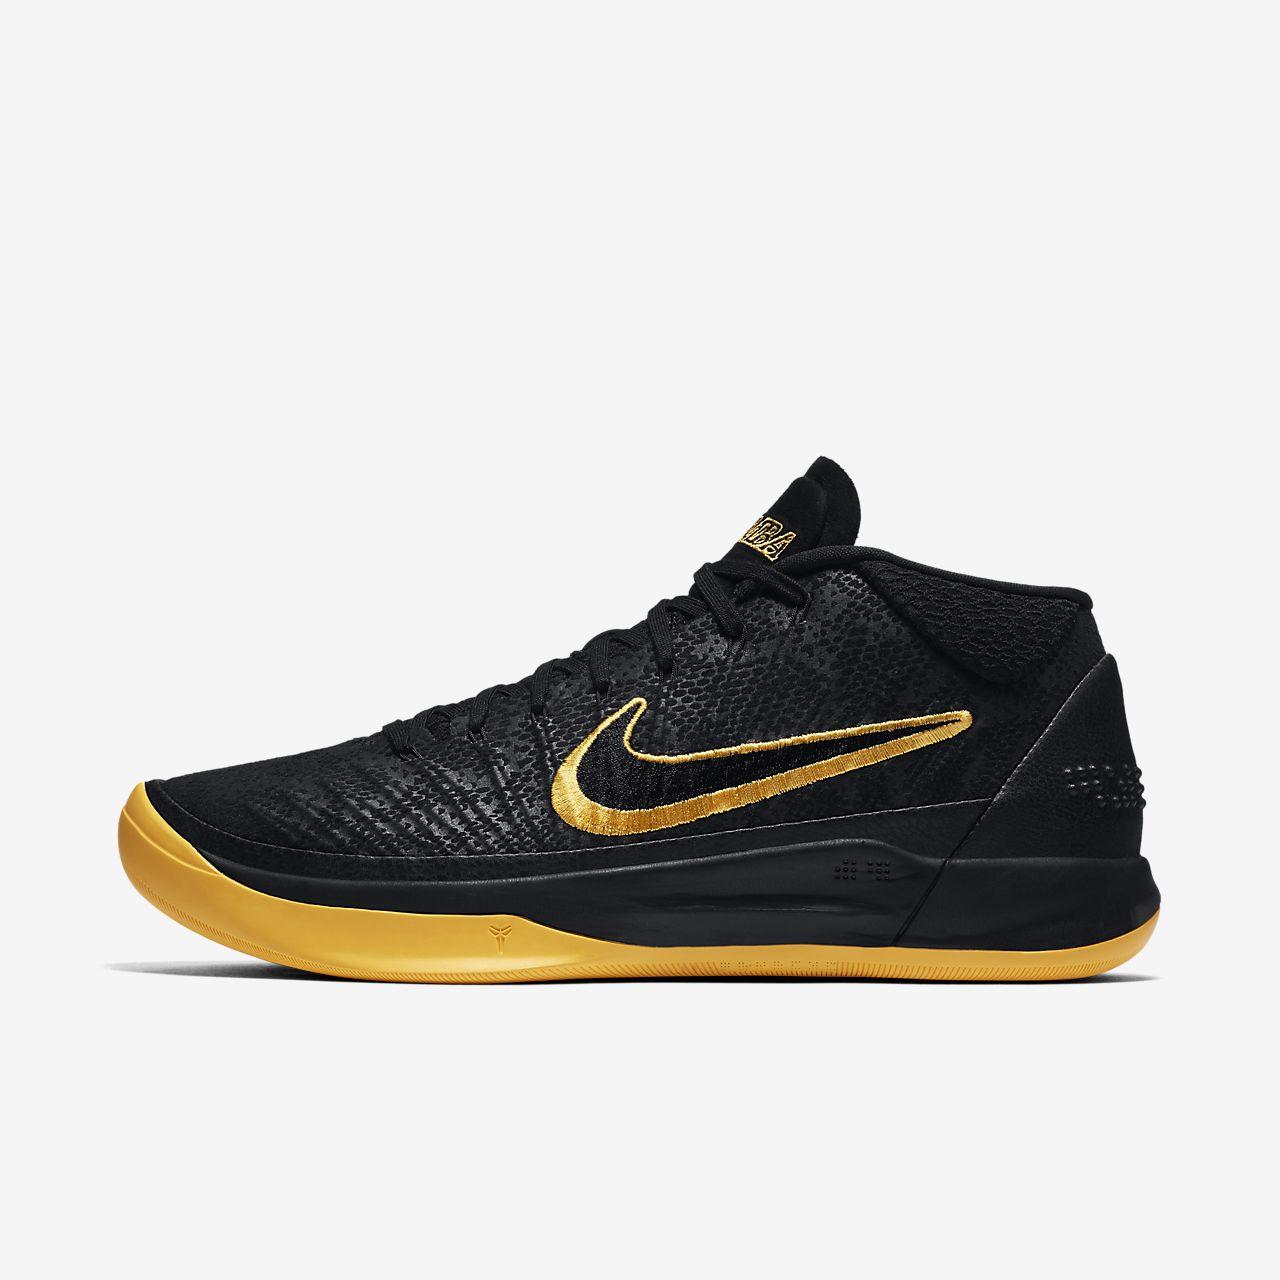 nike kobe a.d. black mamba mens basketball shoe